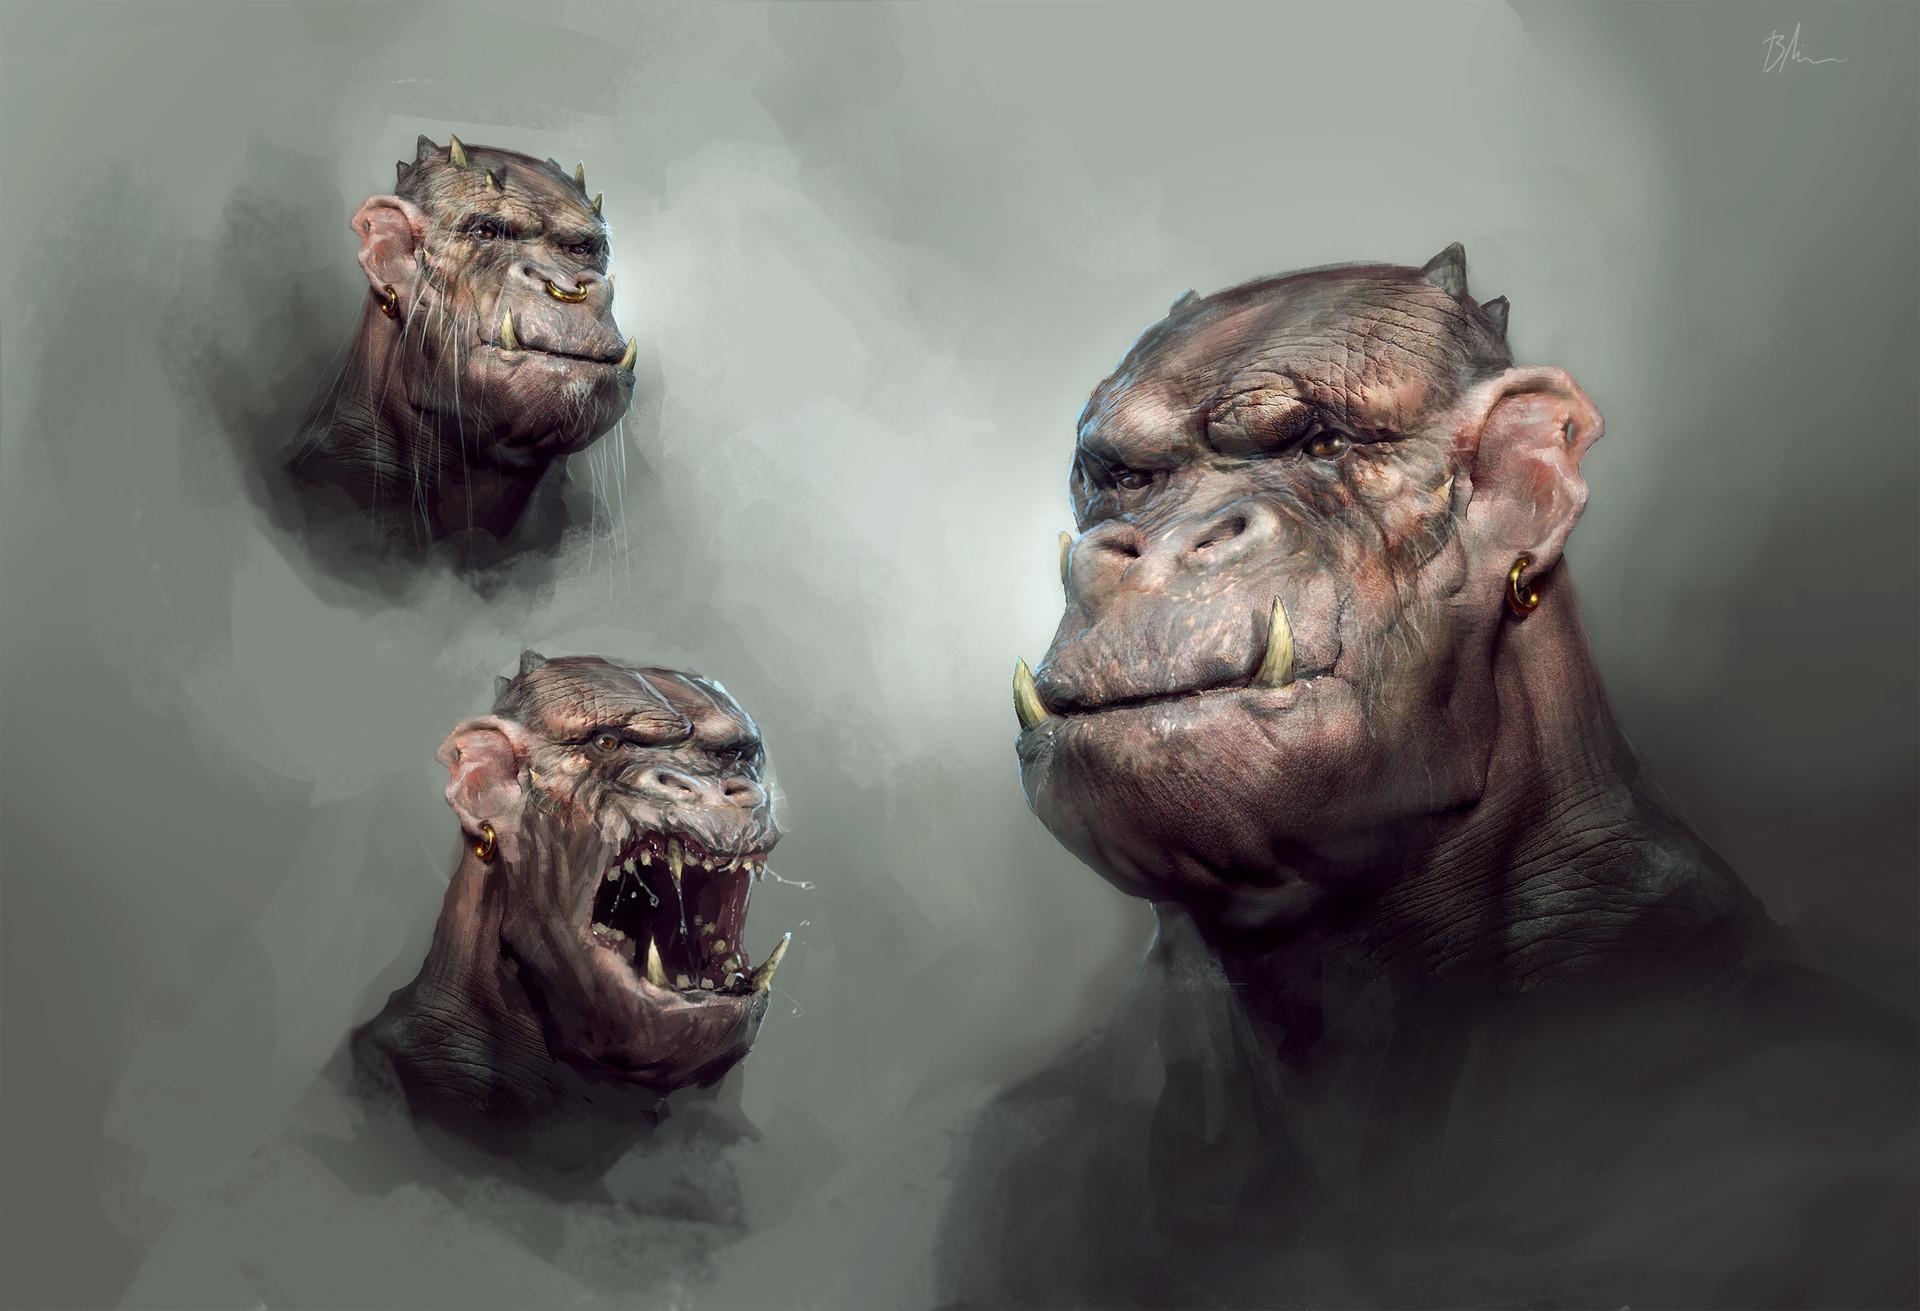 Brent minehan ork concepts